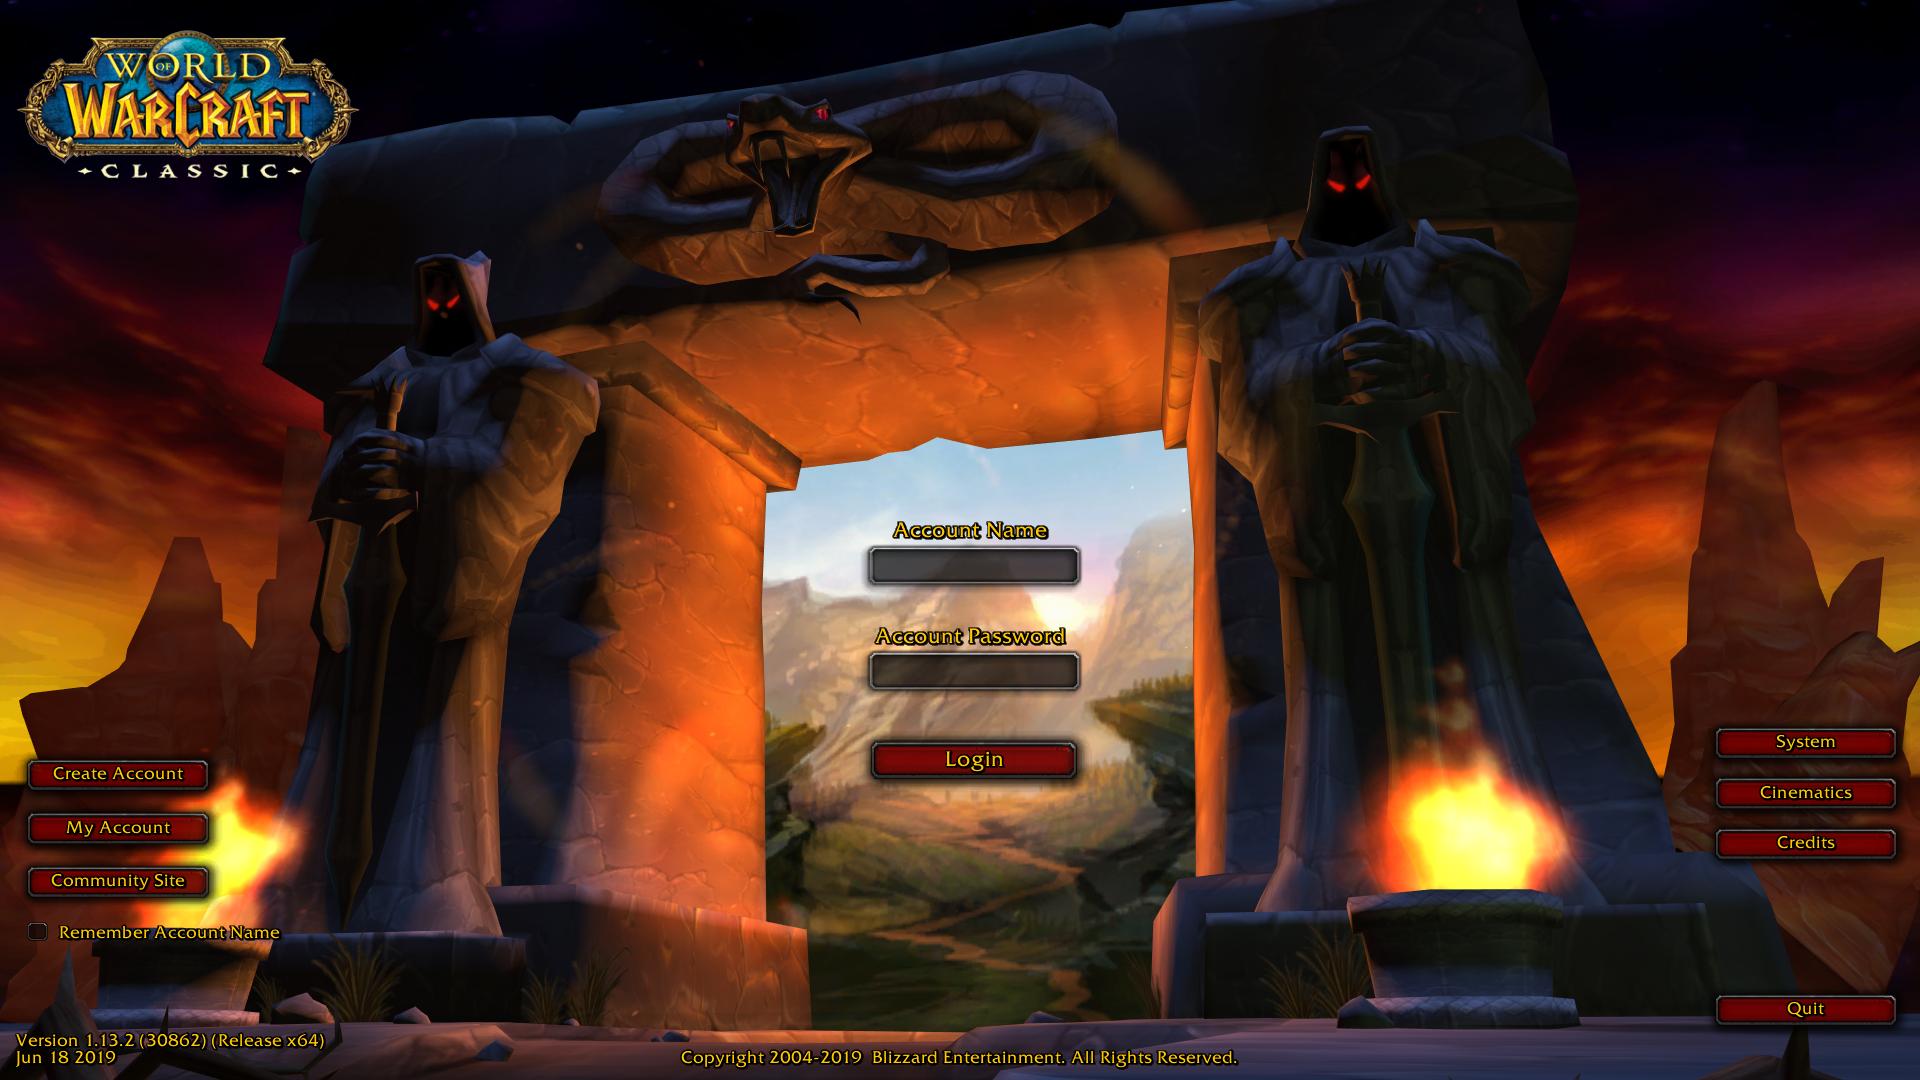 World of Warcraft (Classic) - Lutris